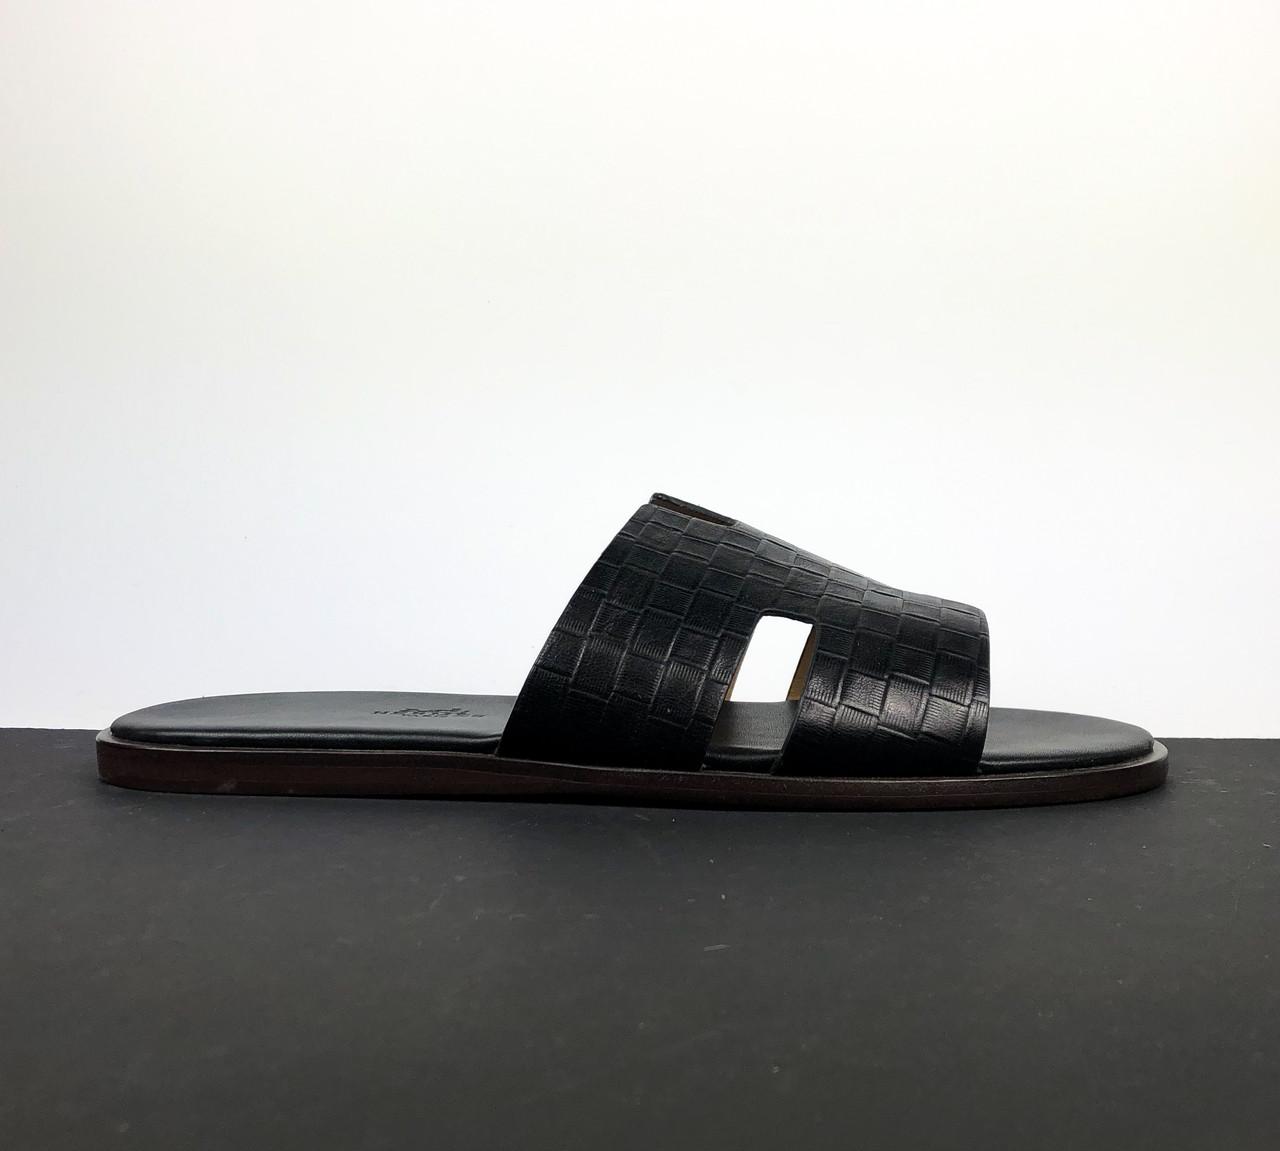 Кожаный шепанцы Hermès